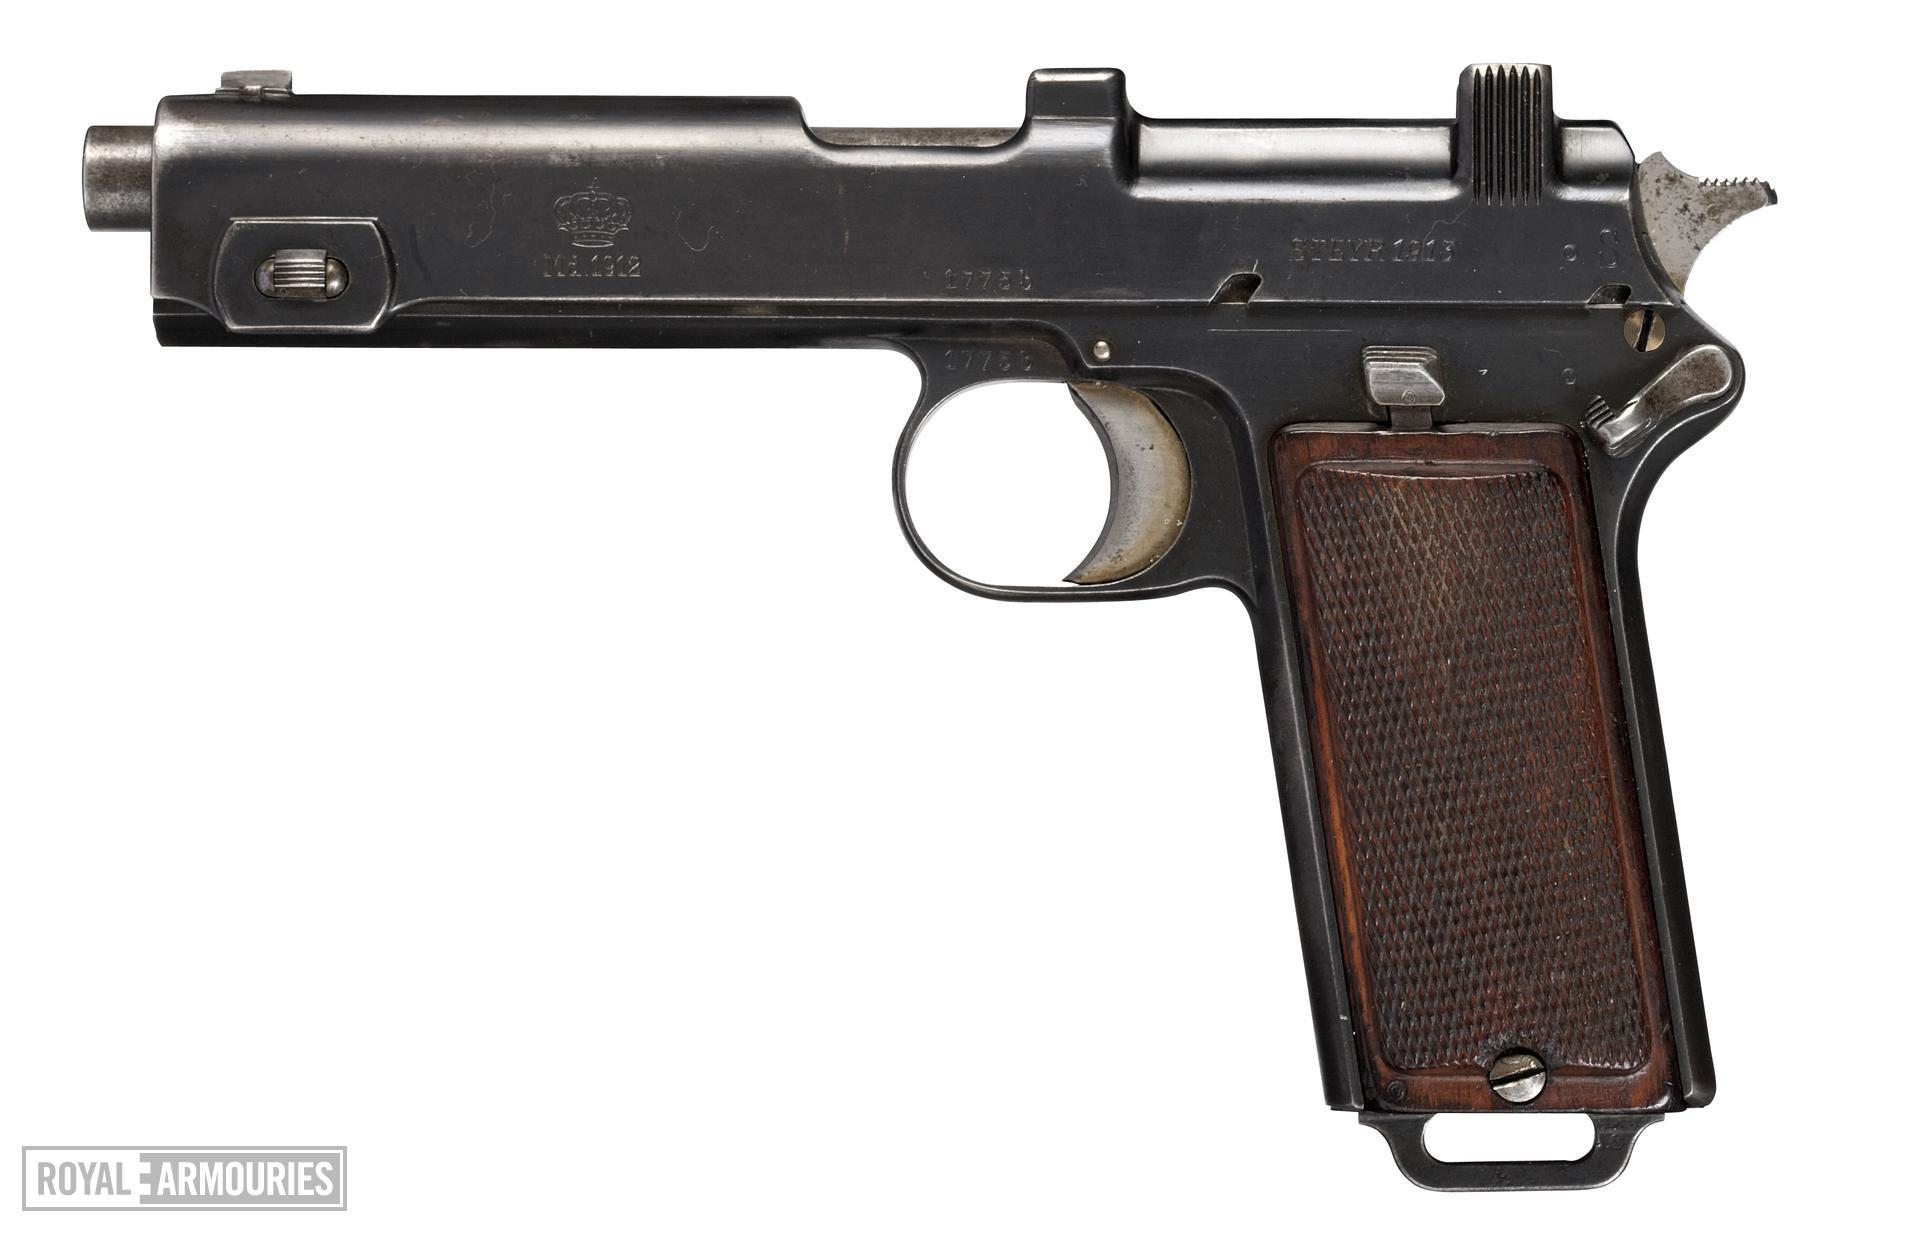 Steyr Hahn Model 1912 pistol, Austrian